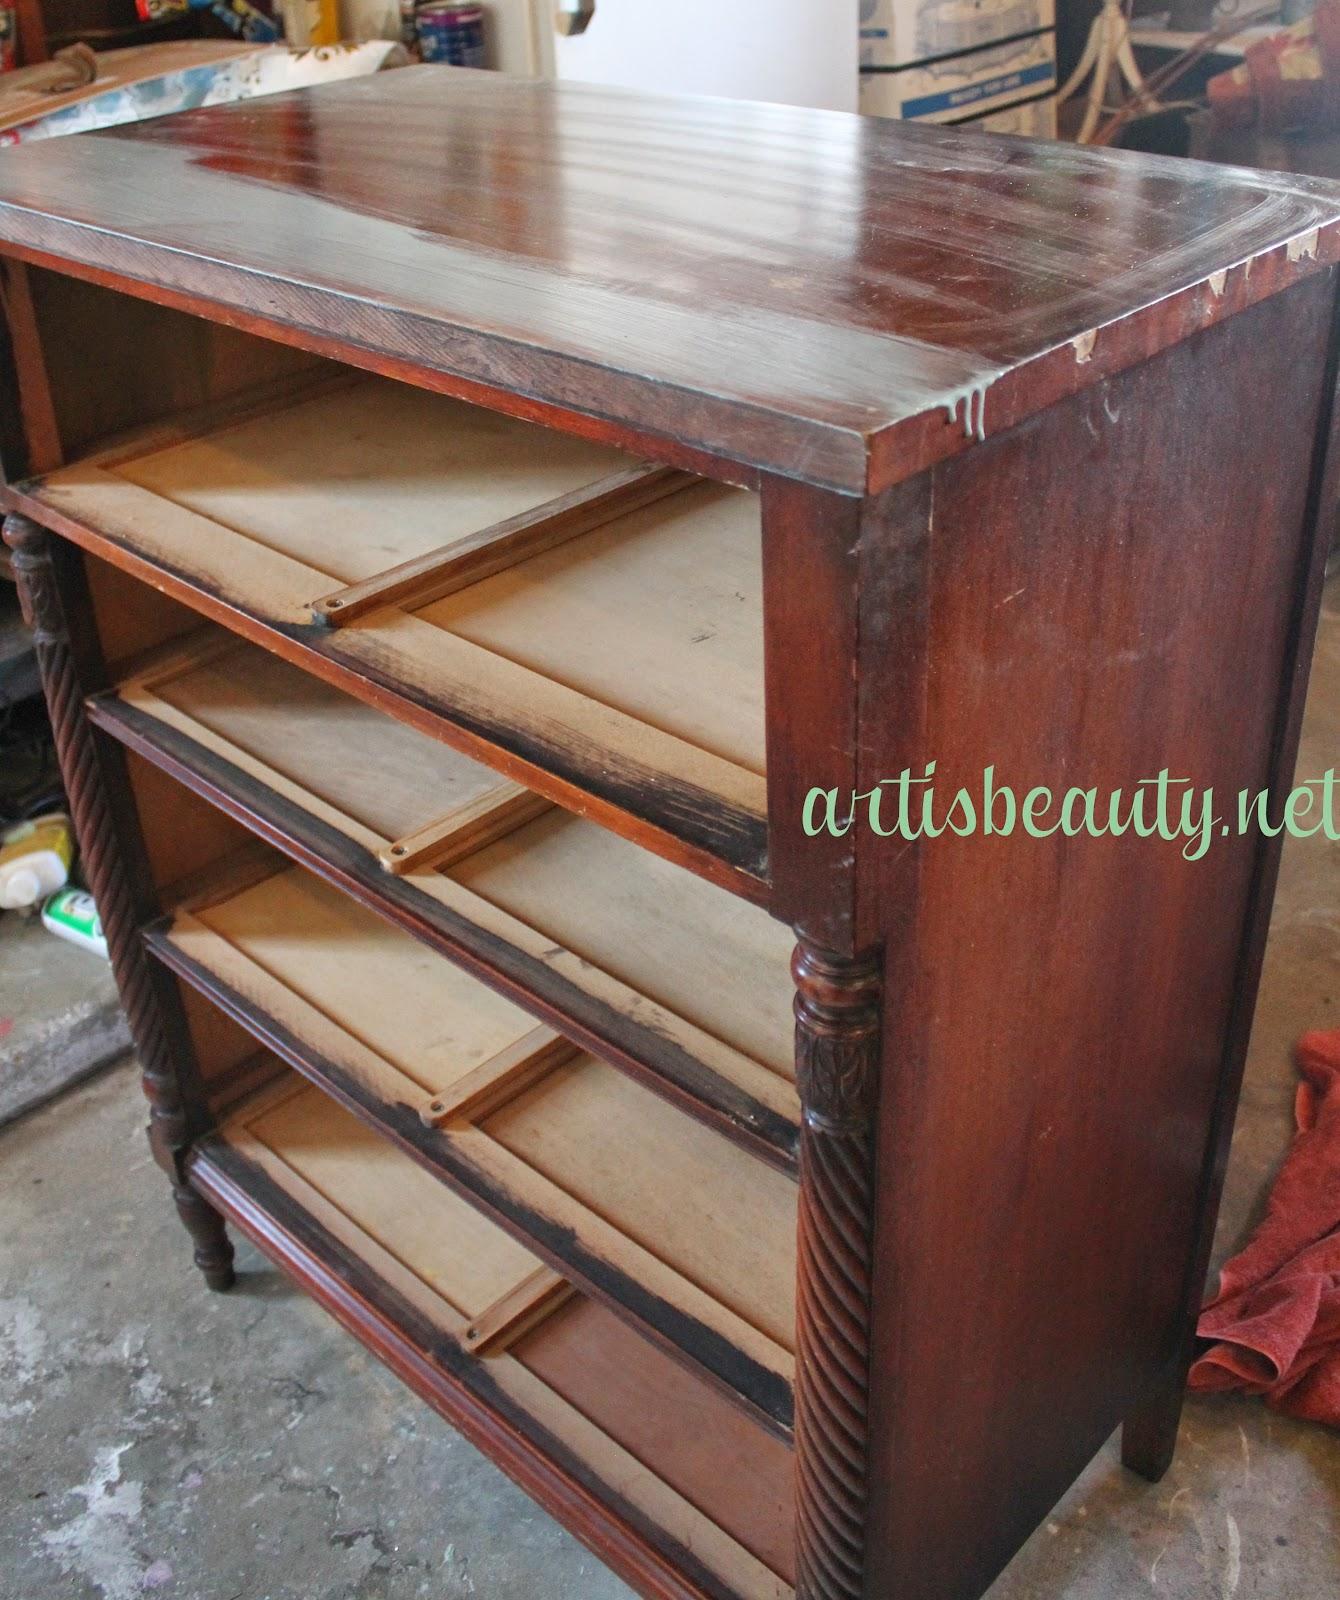 ART IS BEAUTY Antique KINDEL Dresser Makeover and a